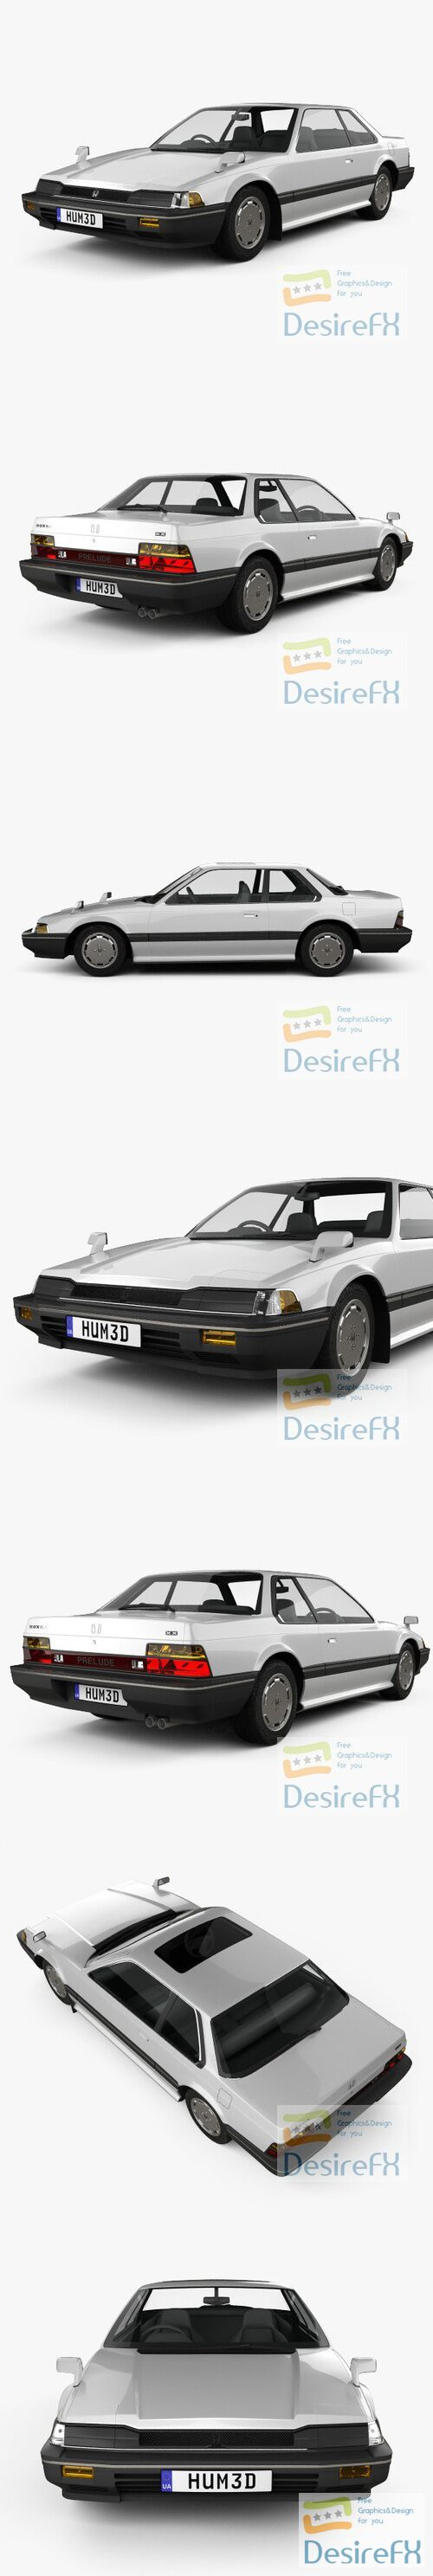 Honda Prelude 1983 3D Model